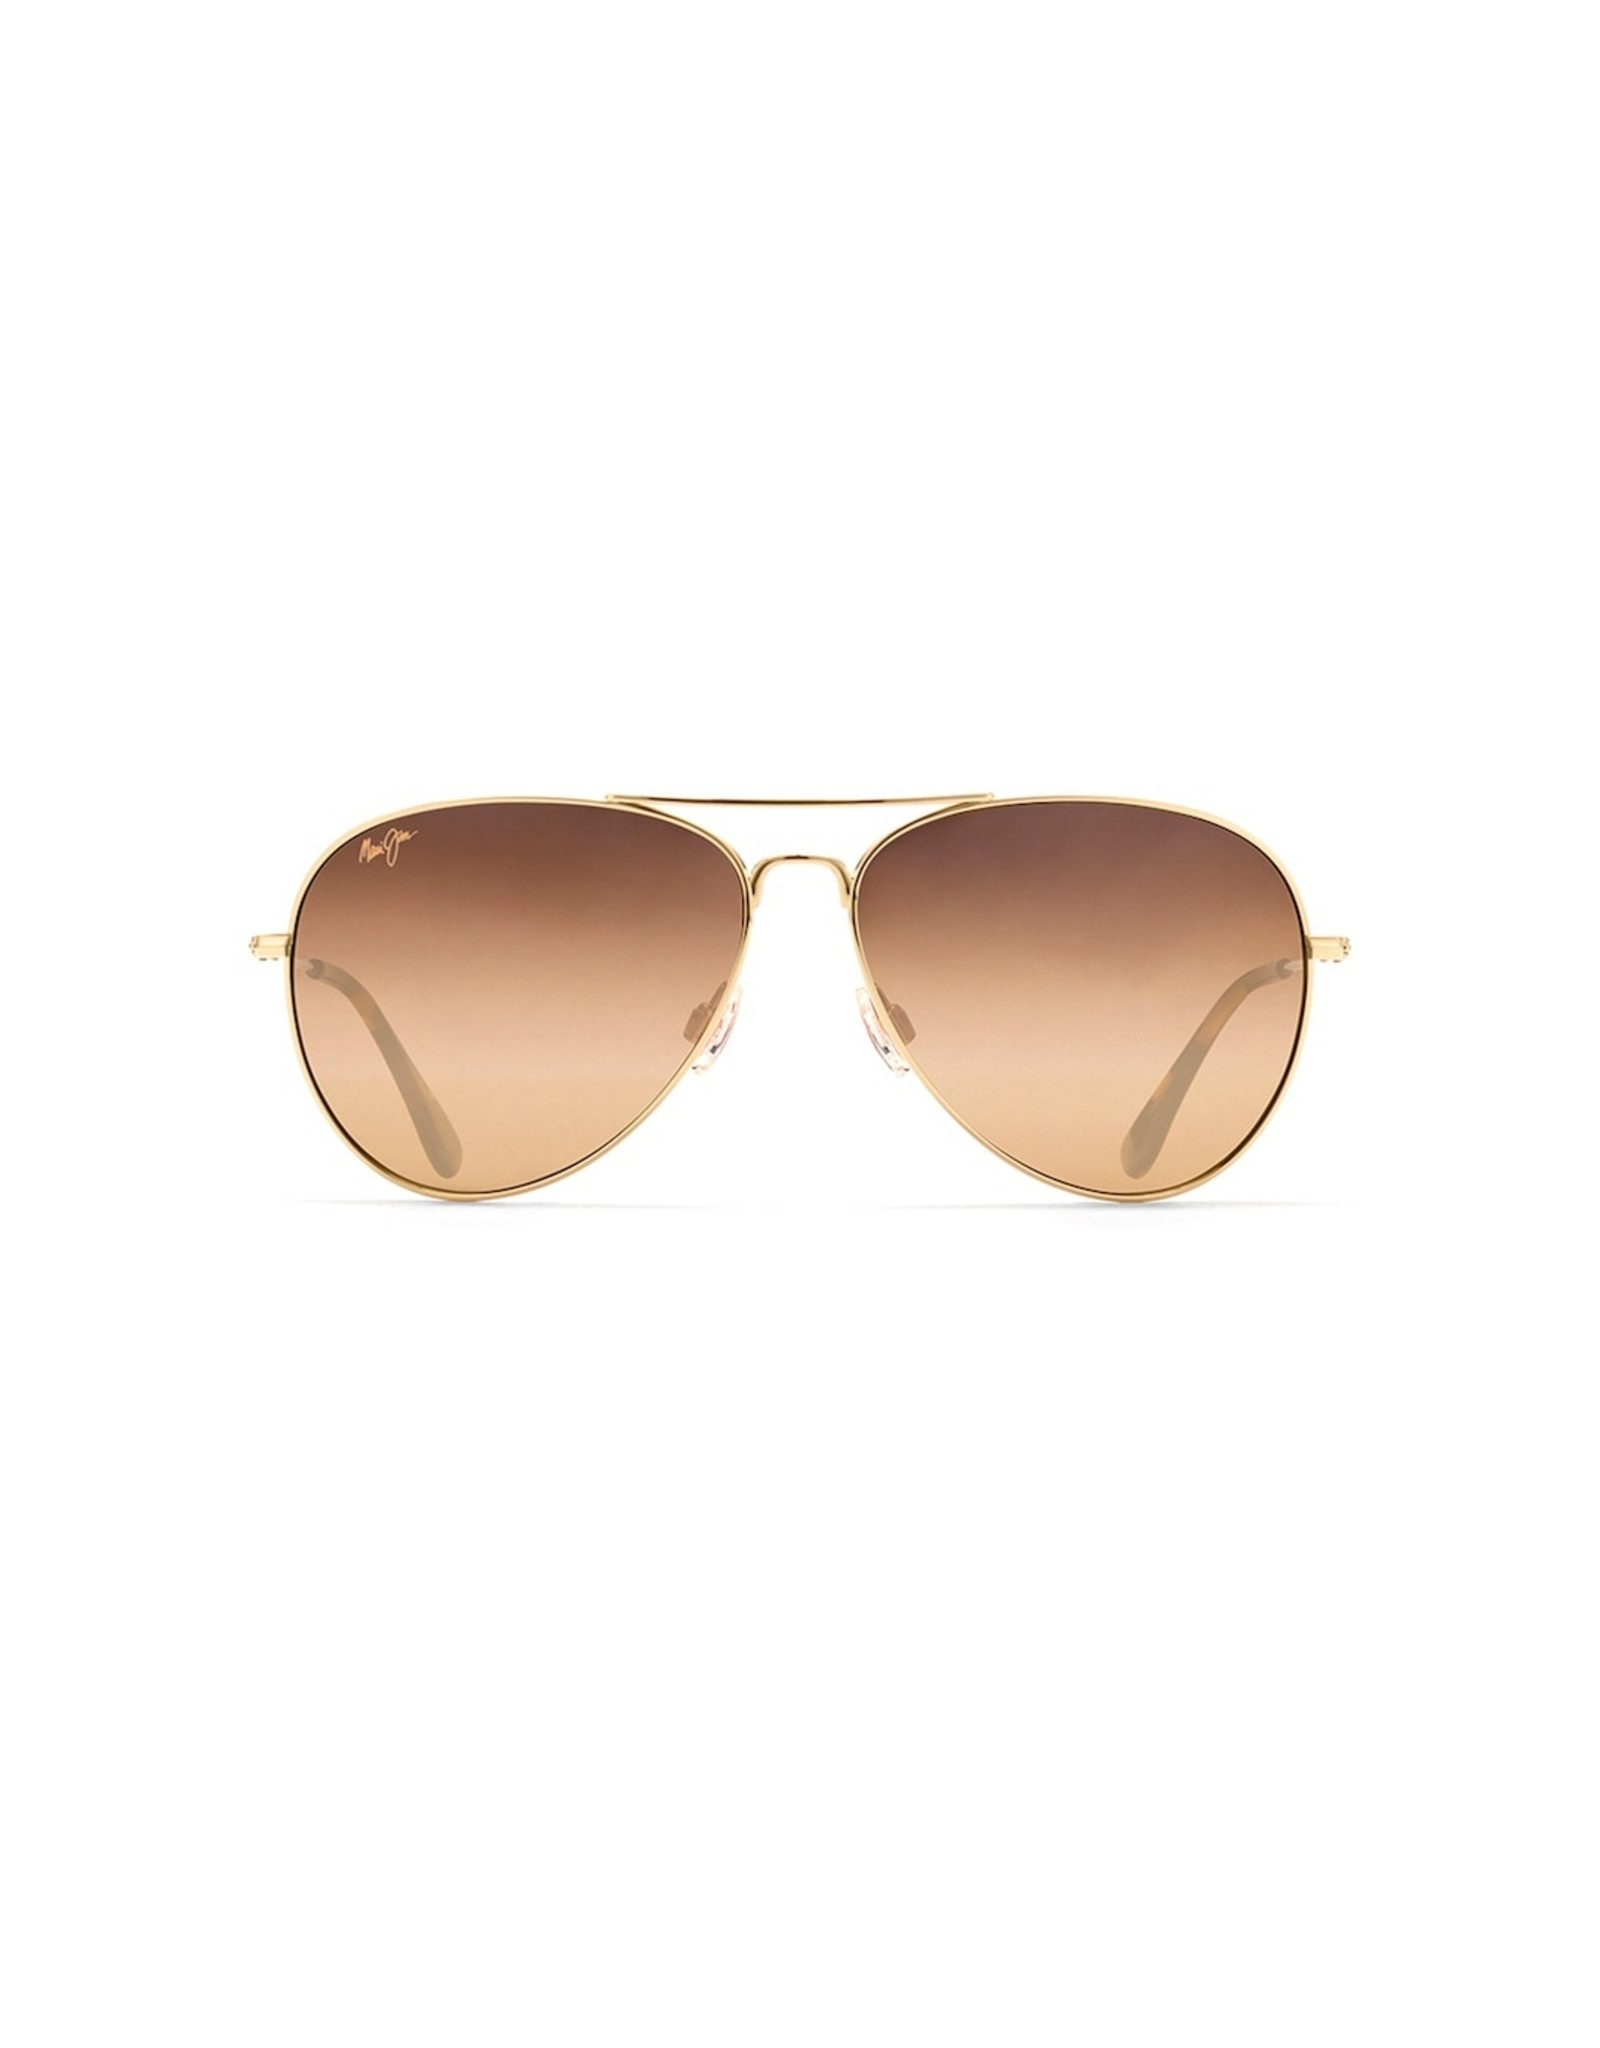 Maui Jim Maui Jim 'Mavericks' Sunglasses